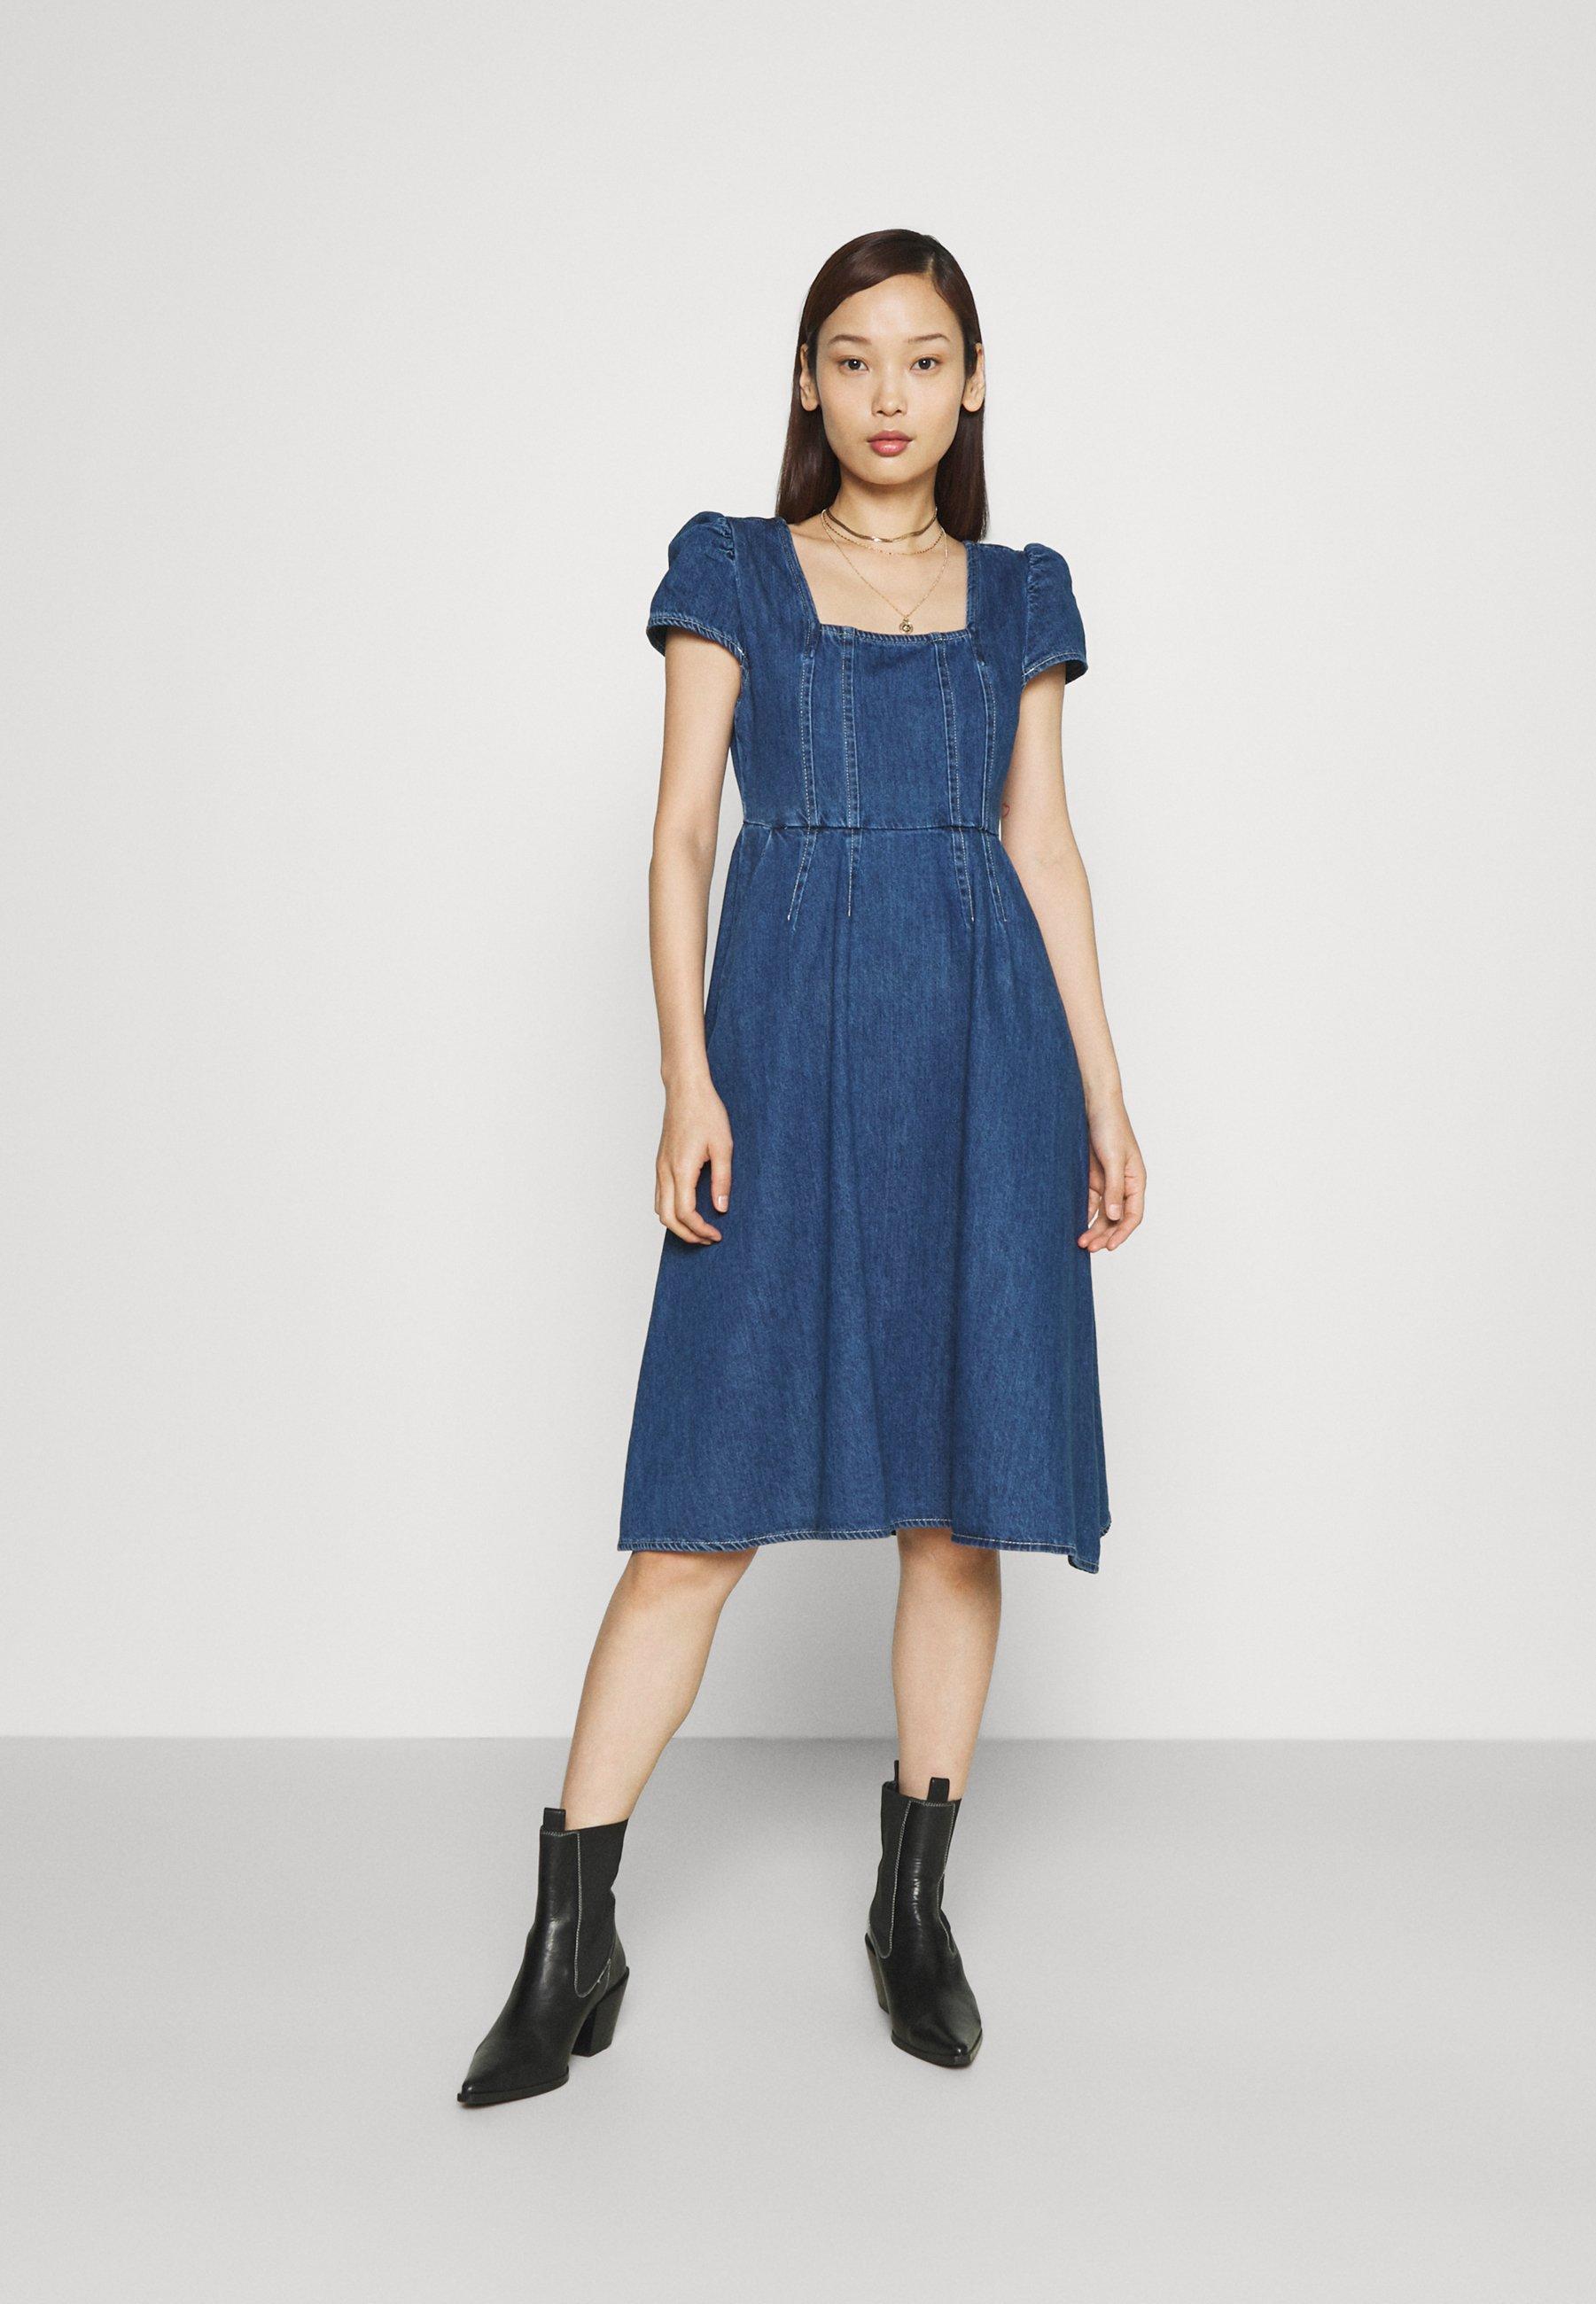 Women LADIES DRESS - Denim dress